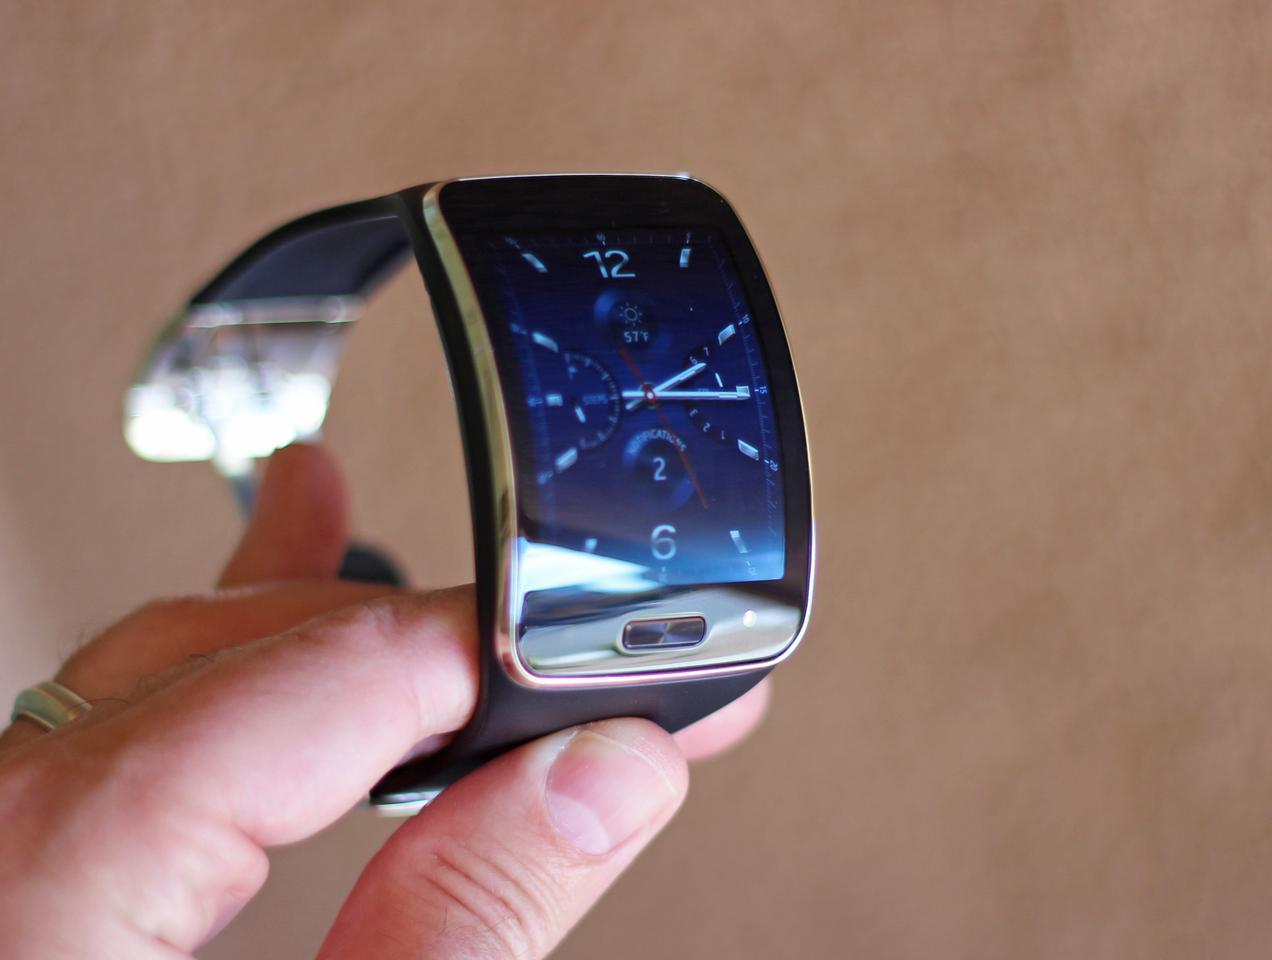 The Samsung Gear S (Photo: Will Shanklin/Gizmag.com)